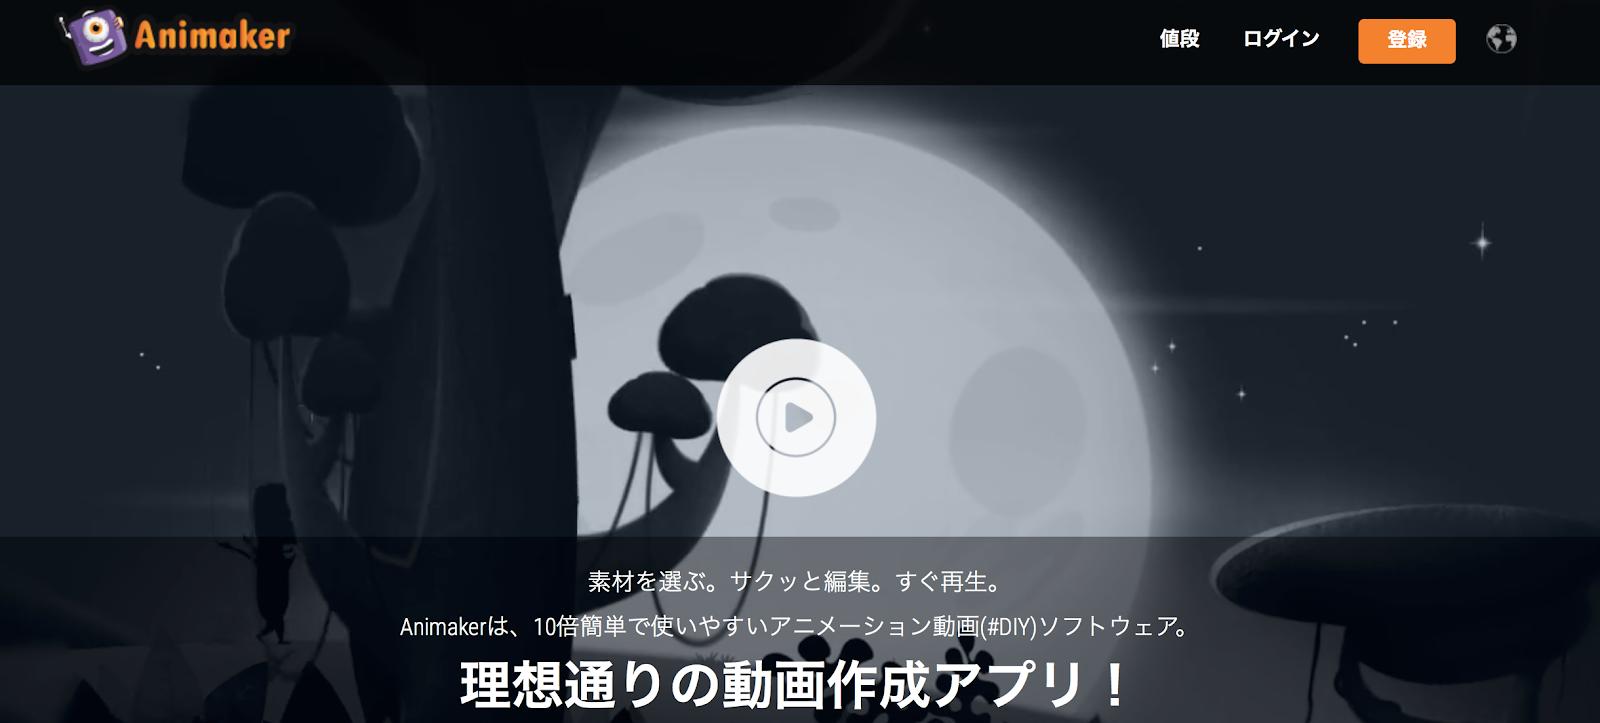 59_animationtool_4.png